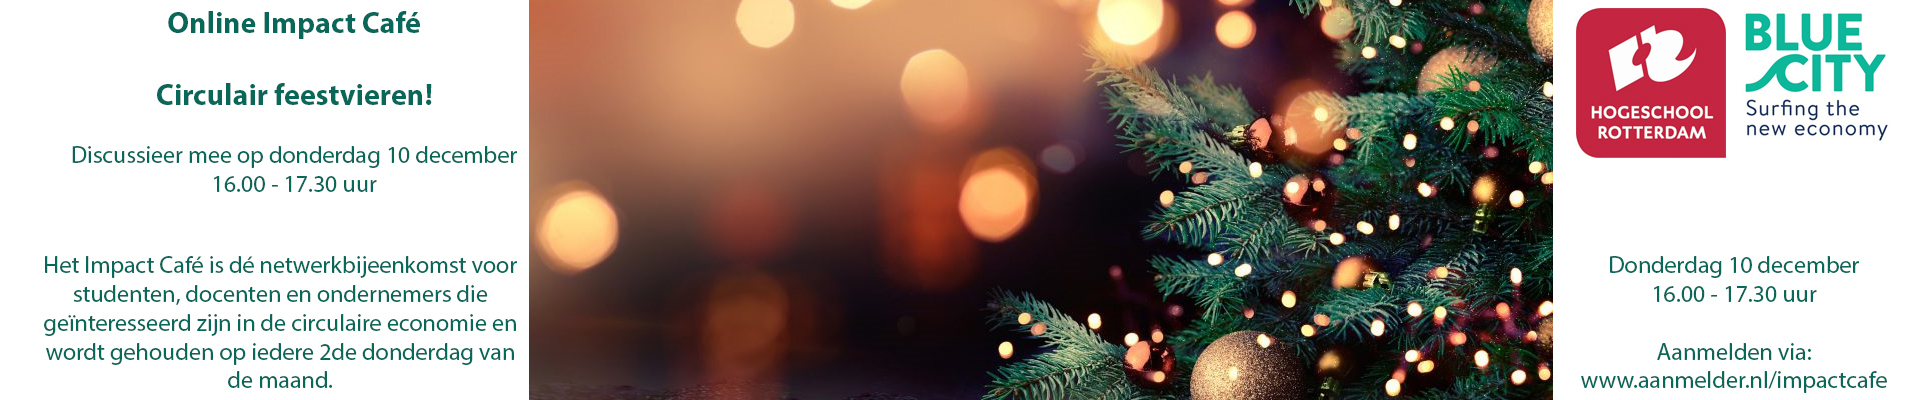 Online Impact Café December: Circulair feestvieren!